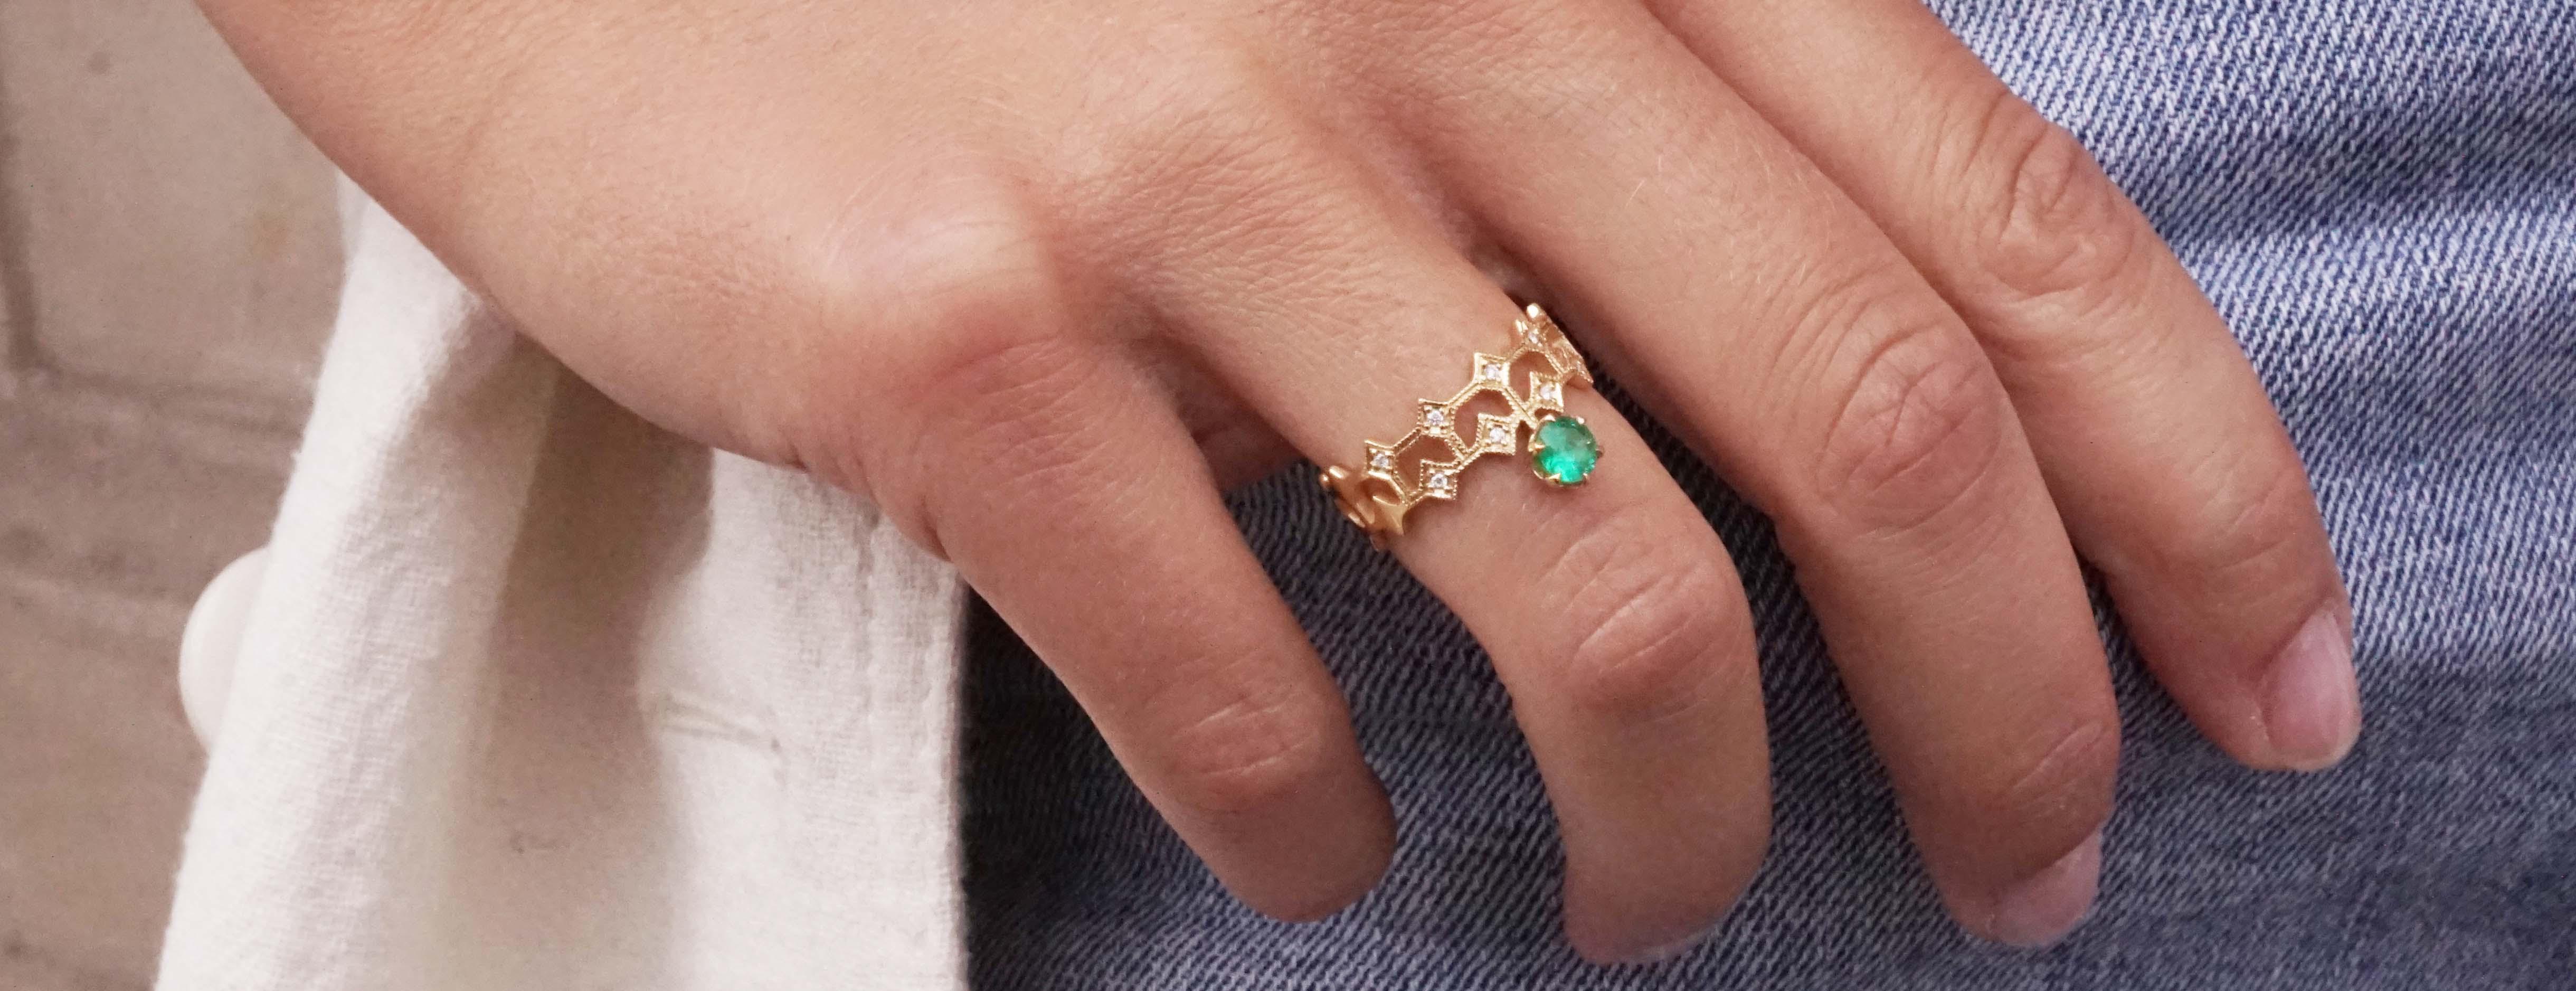 Mocielli fine jewellery collection